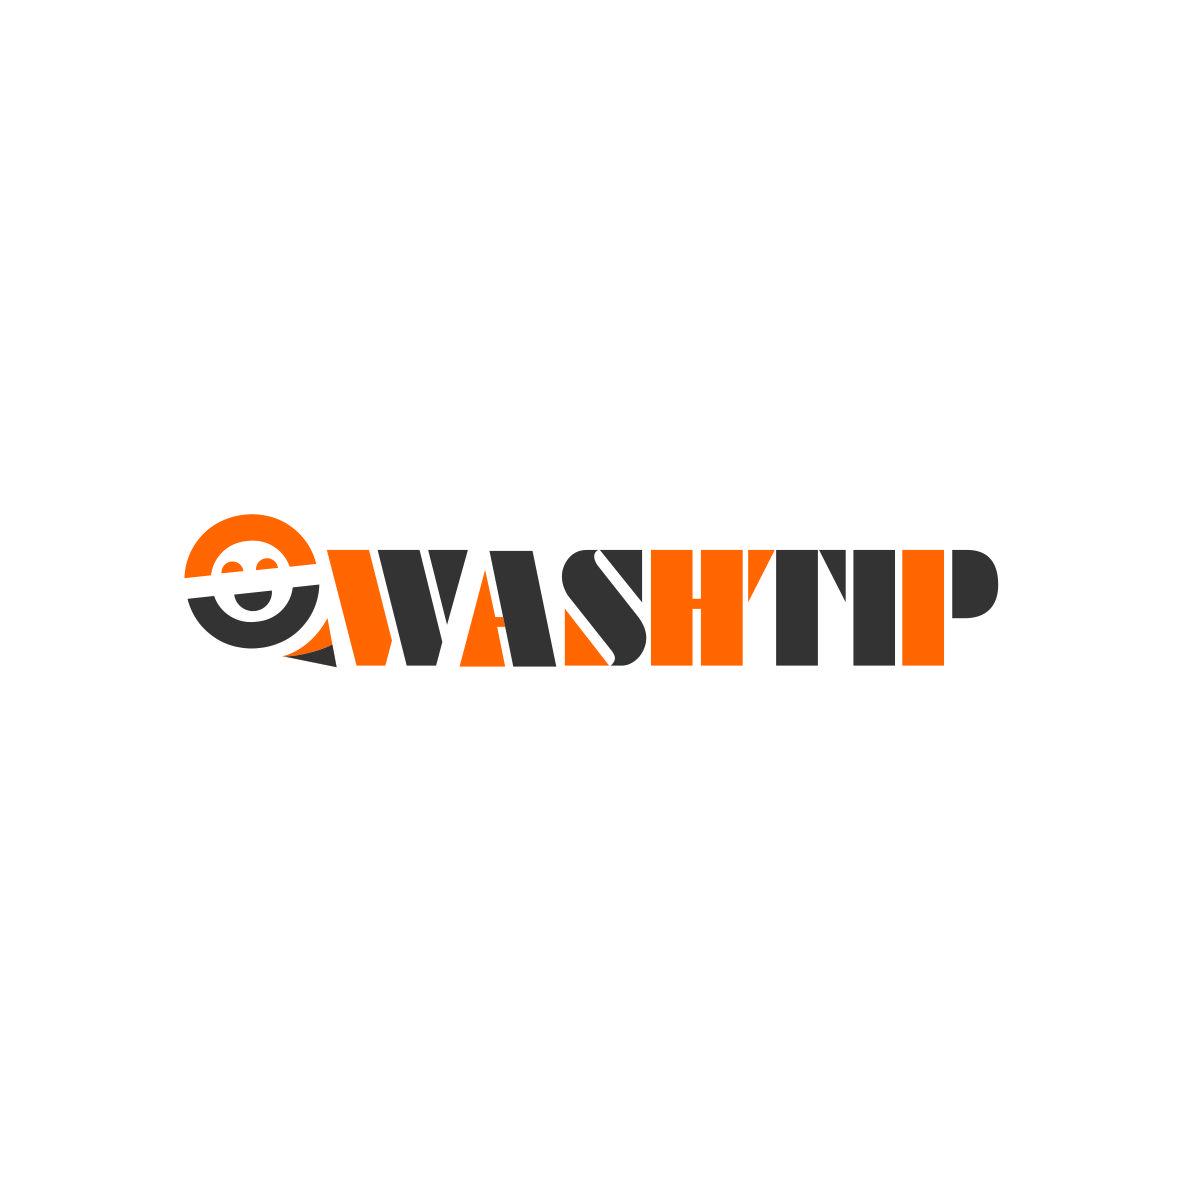 Разработка логотипа для онлайн-сервиса химчистки фото f_8865c04b9efbe8bf.jpg